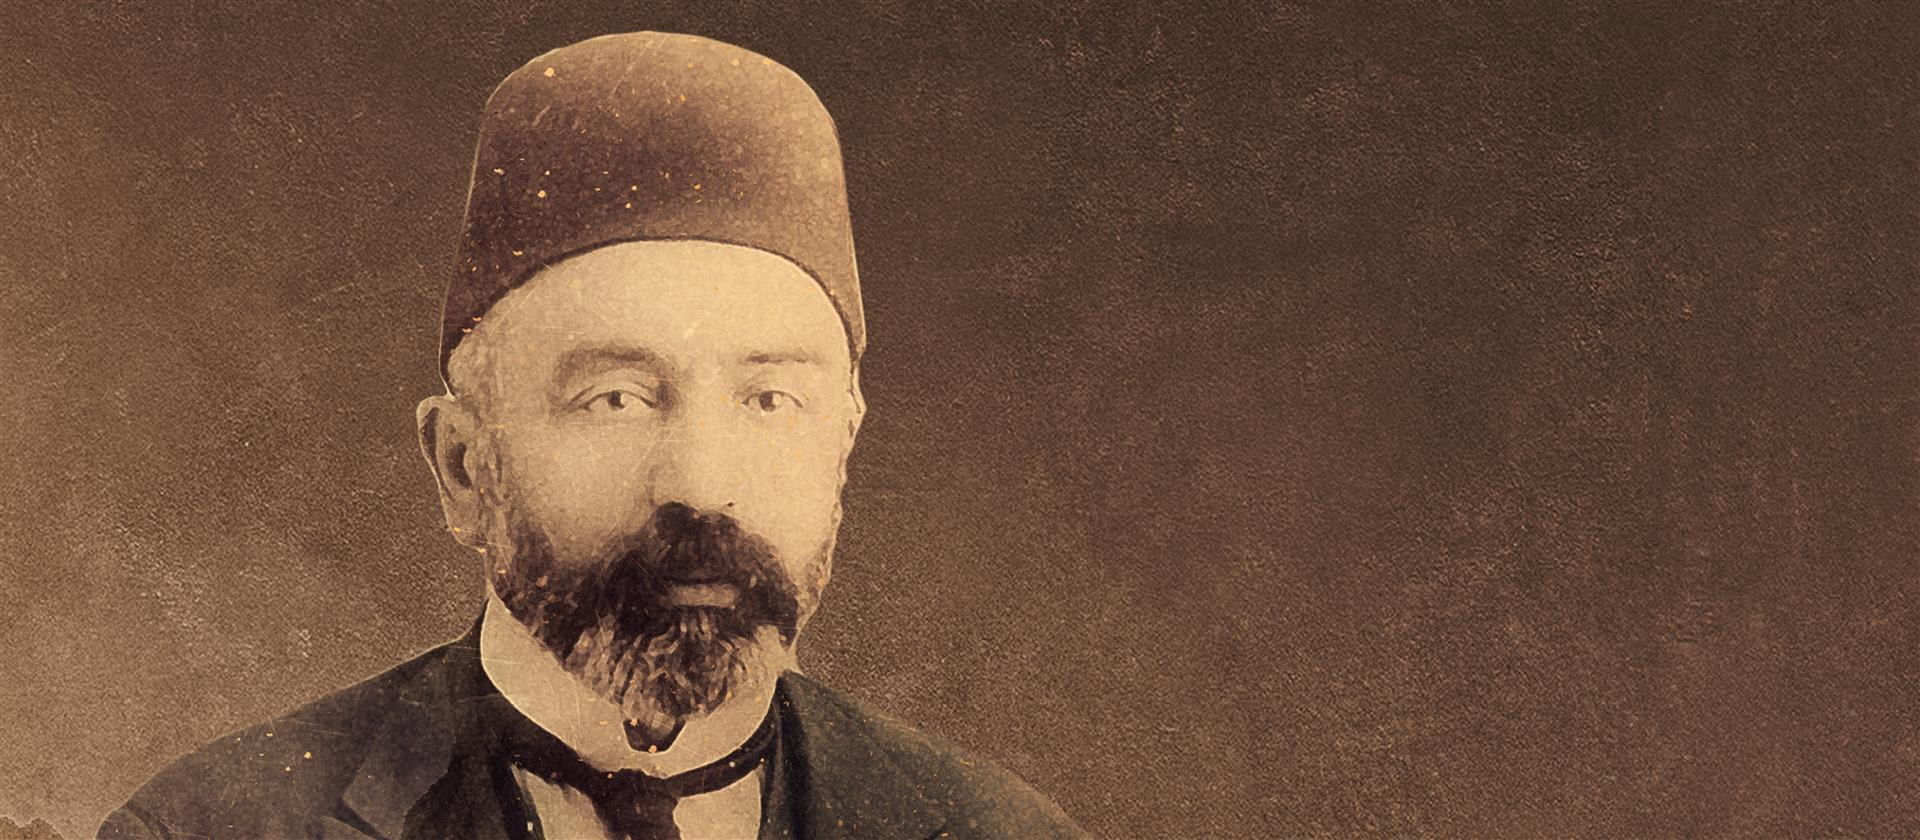 HAFIZ MEHMET AKİF ERSOY'UN KUR'AN SEVDASI